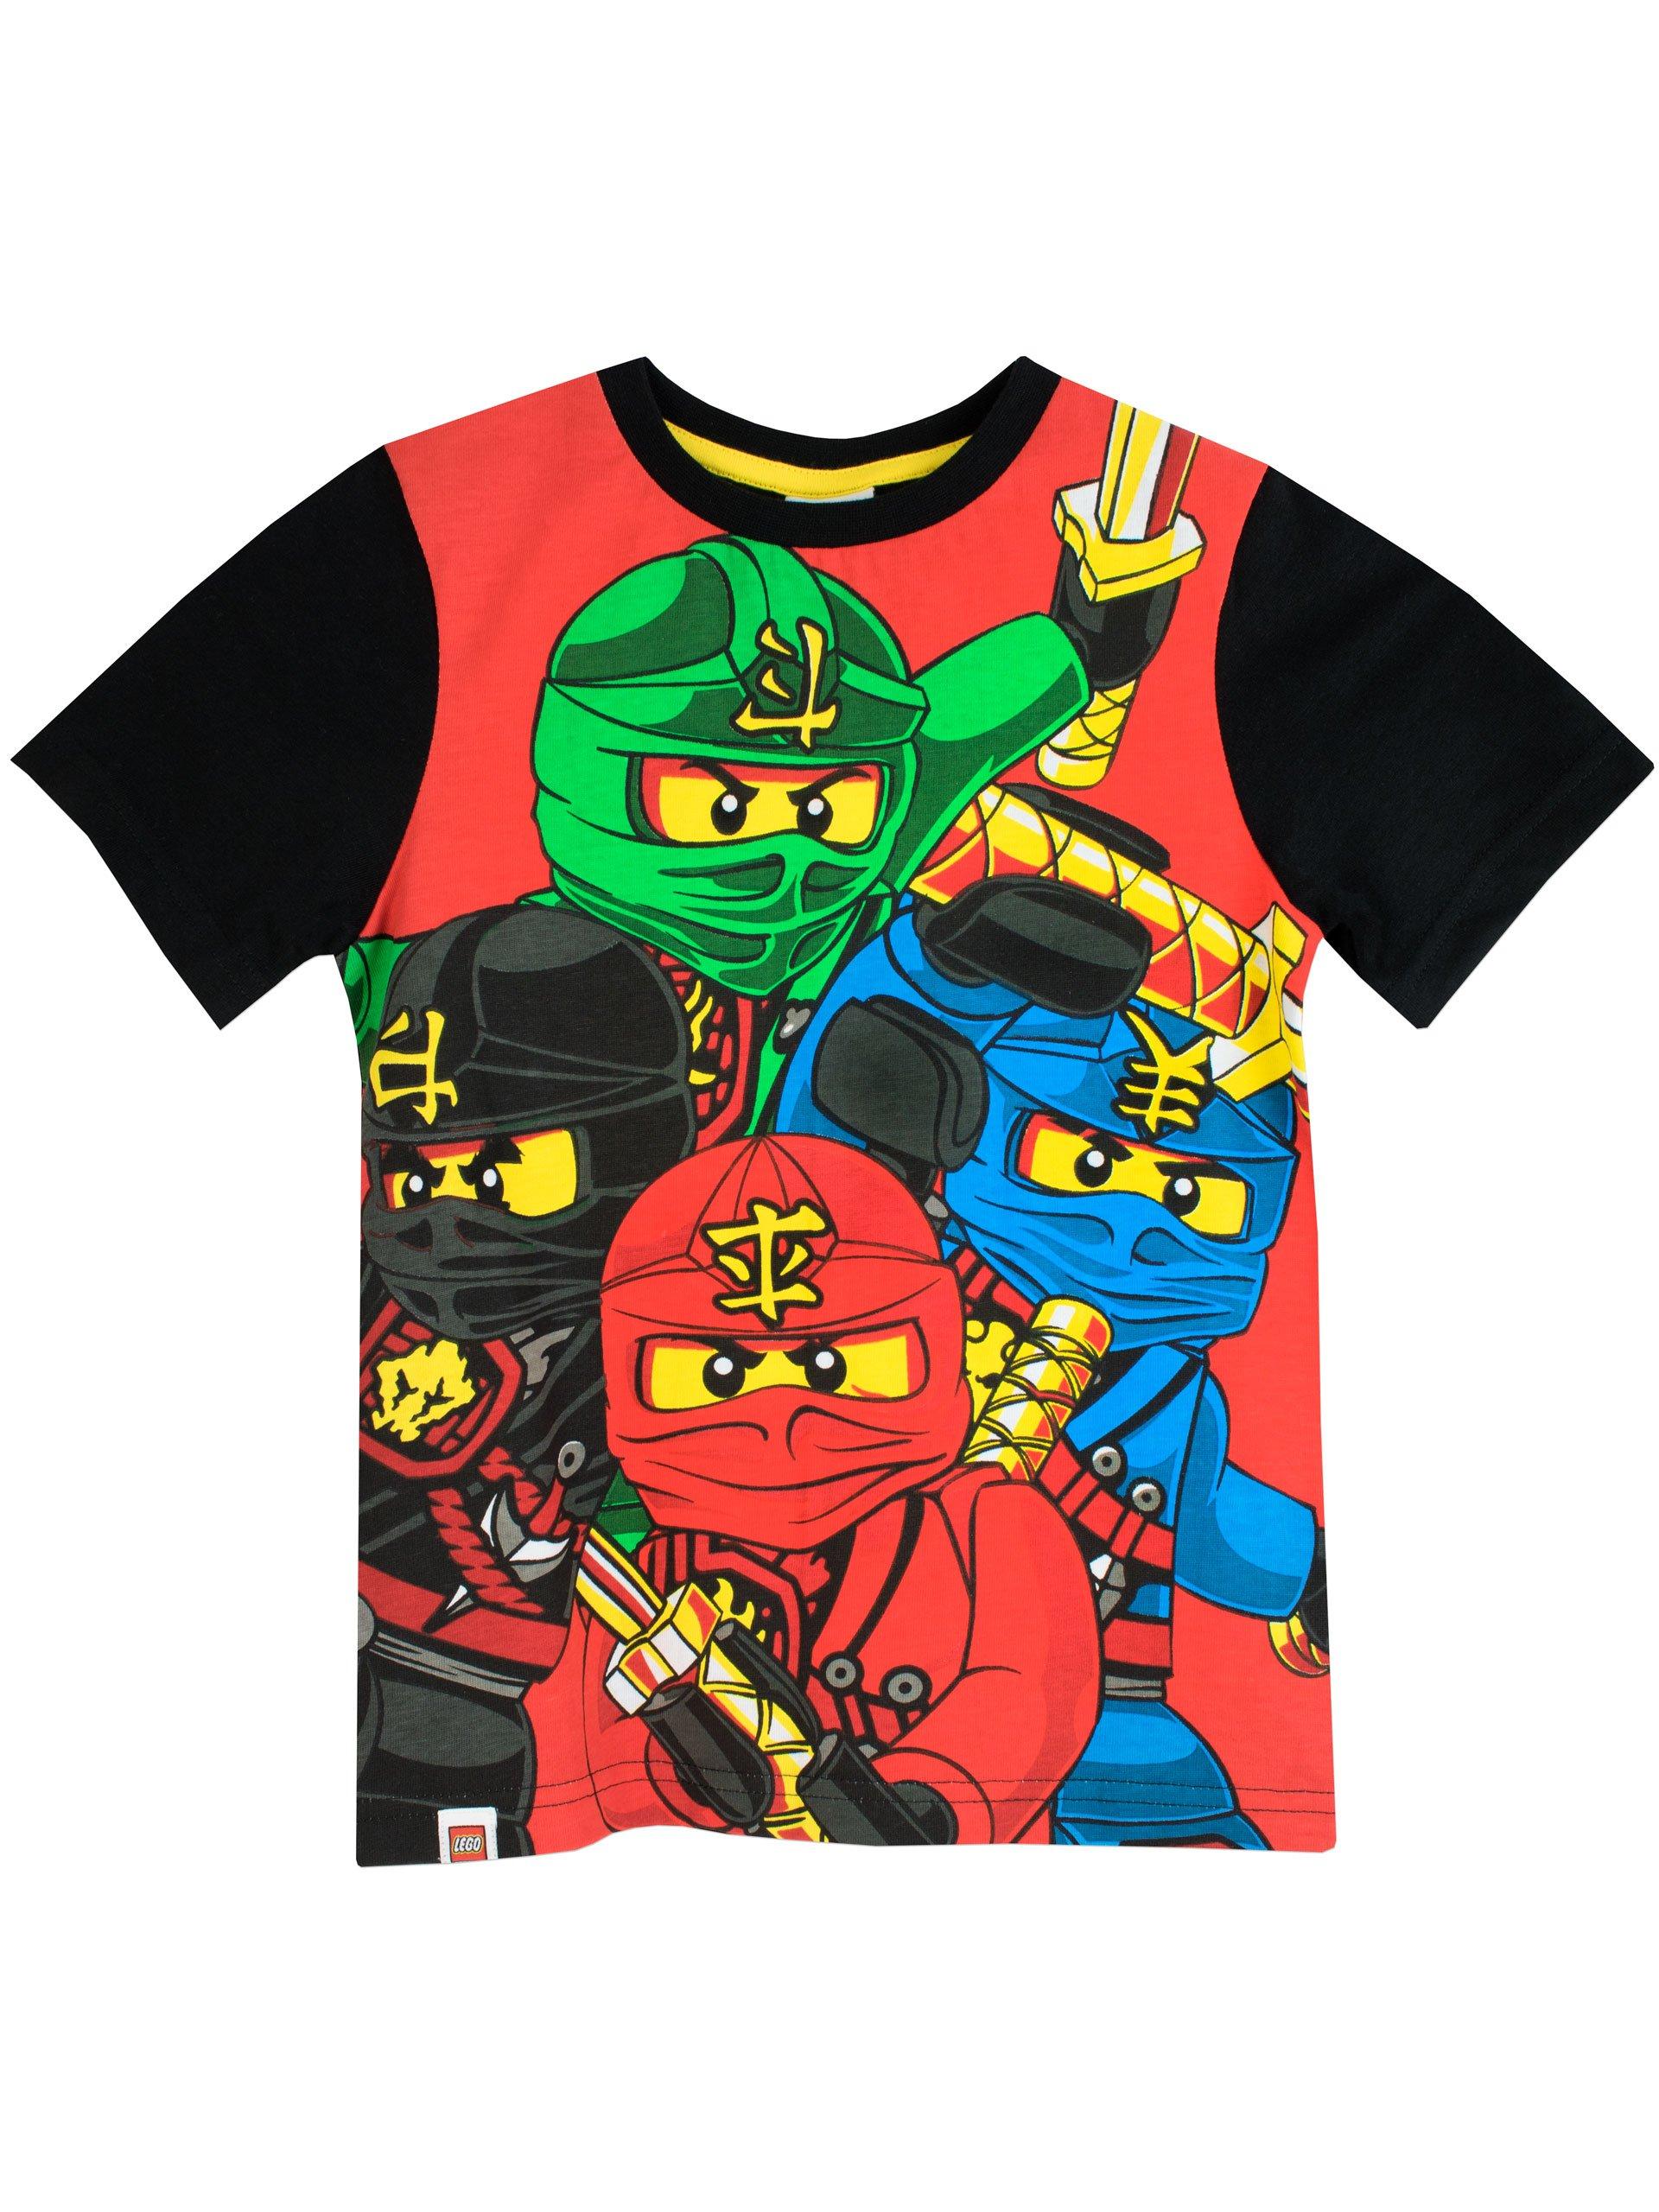 Lego Ninjago - Camiseta para niño - Lego Ninjago product image